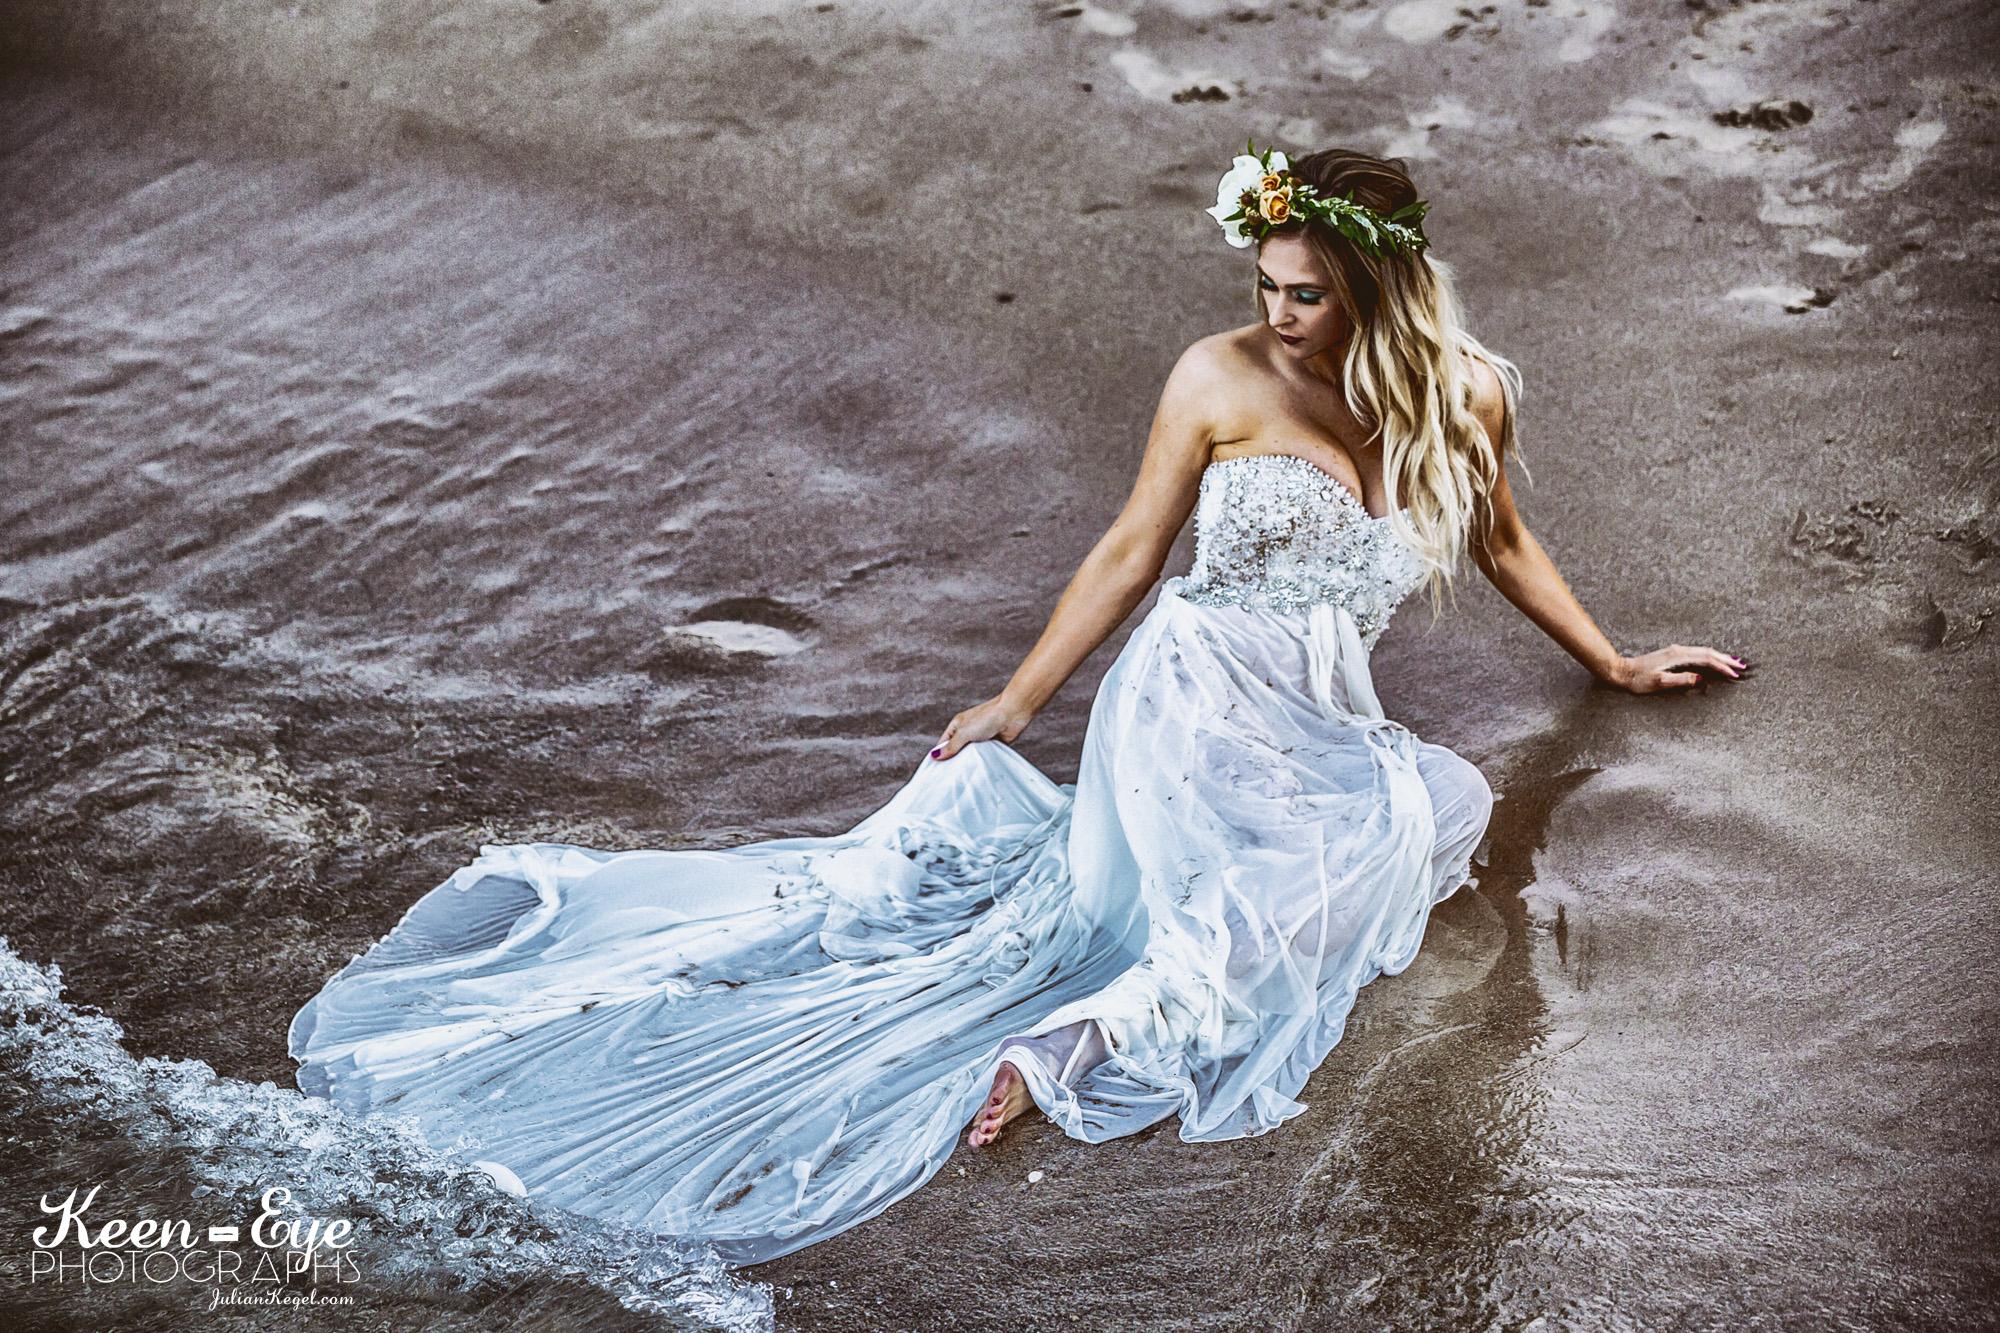 Ditch the dress_KrissyOleson_2017 (47).jpg